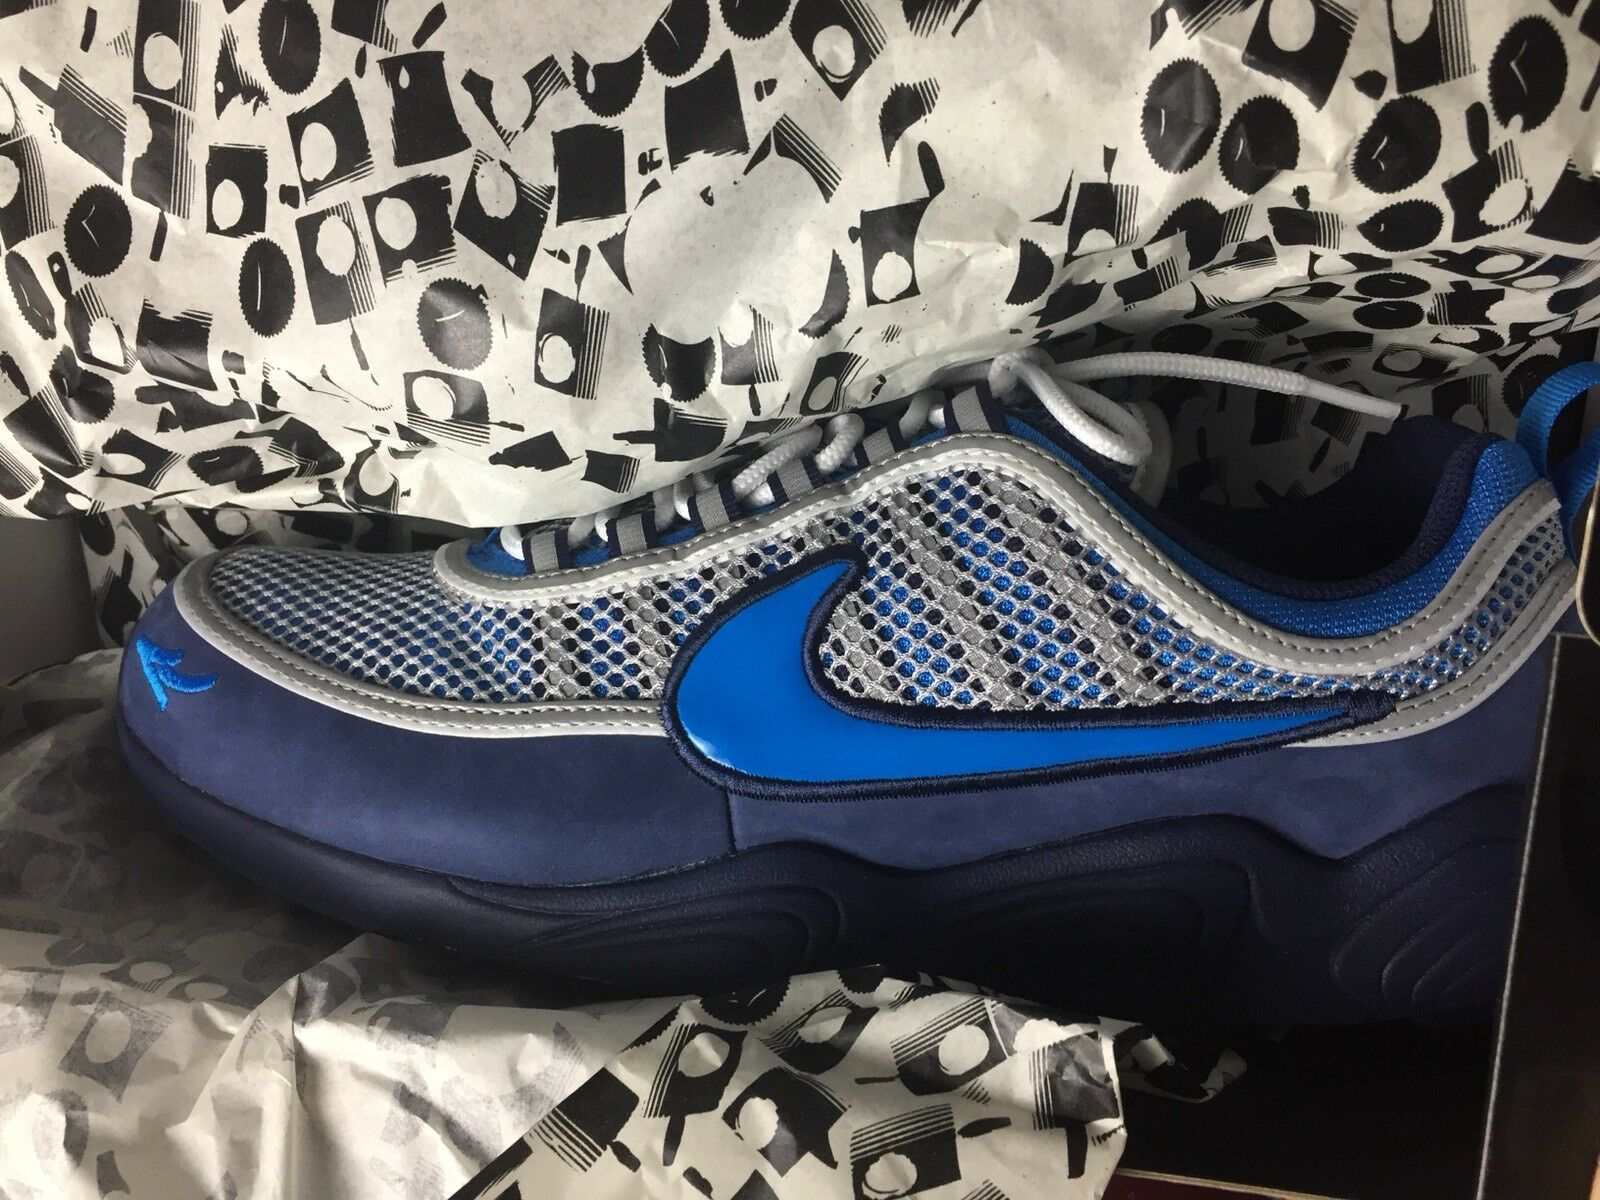 DS 2017 Nike Air Zoom Spiridon '16 x STASH (AH7973-400) Size 12